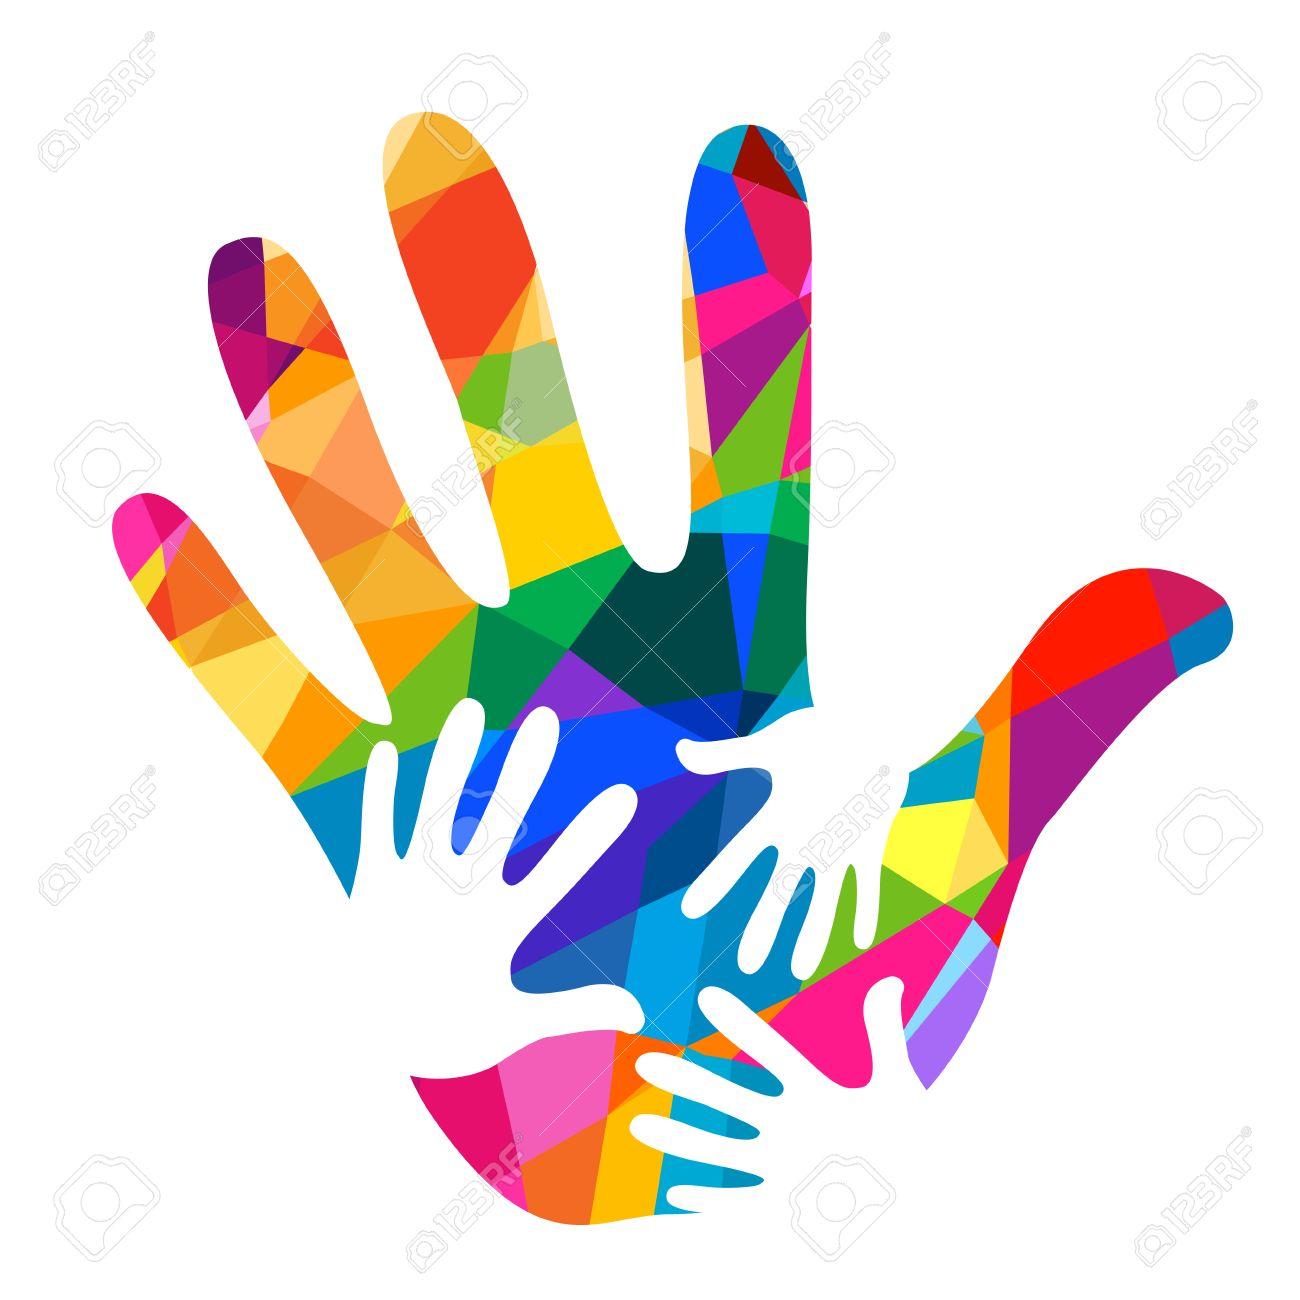 hands helping illustration background - 55948888